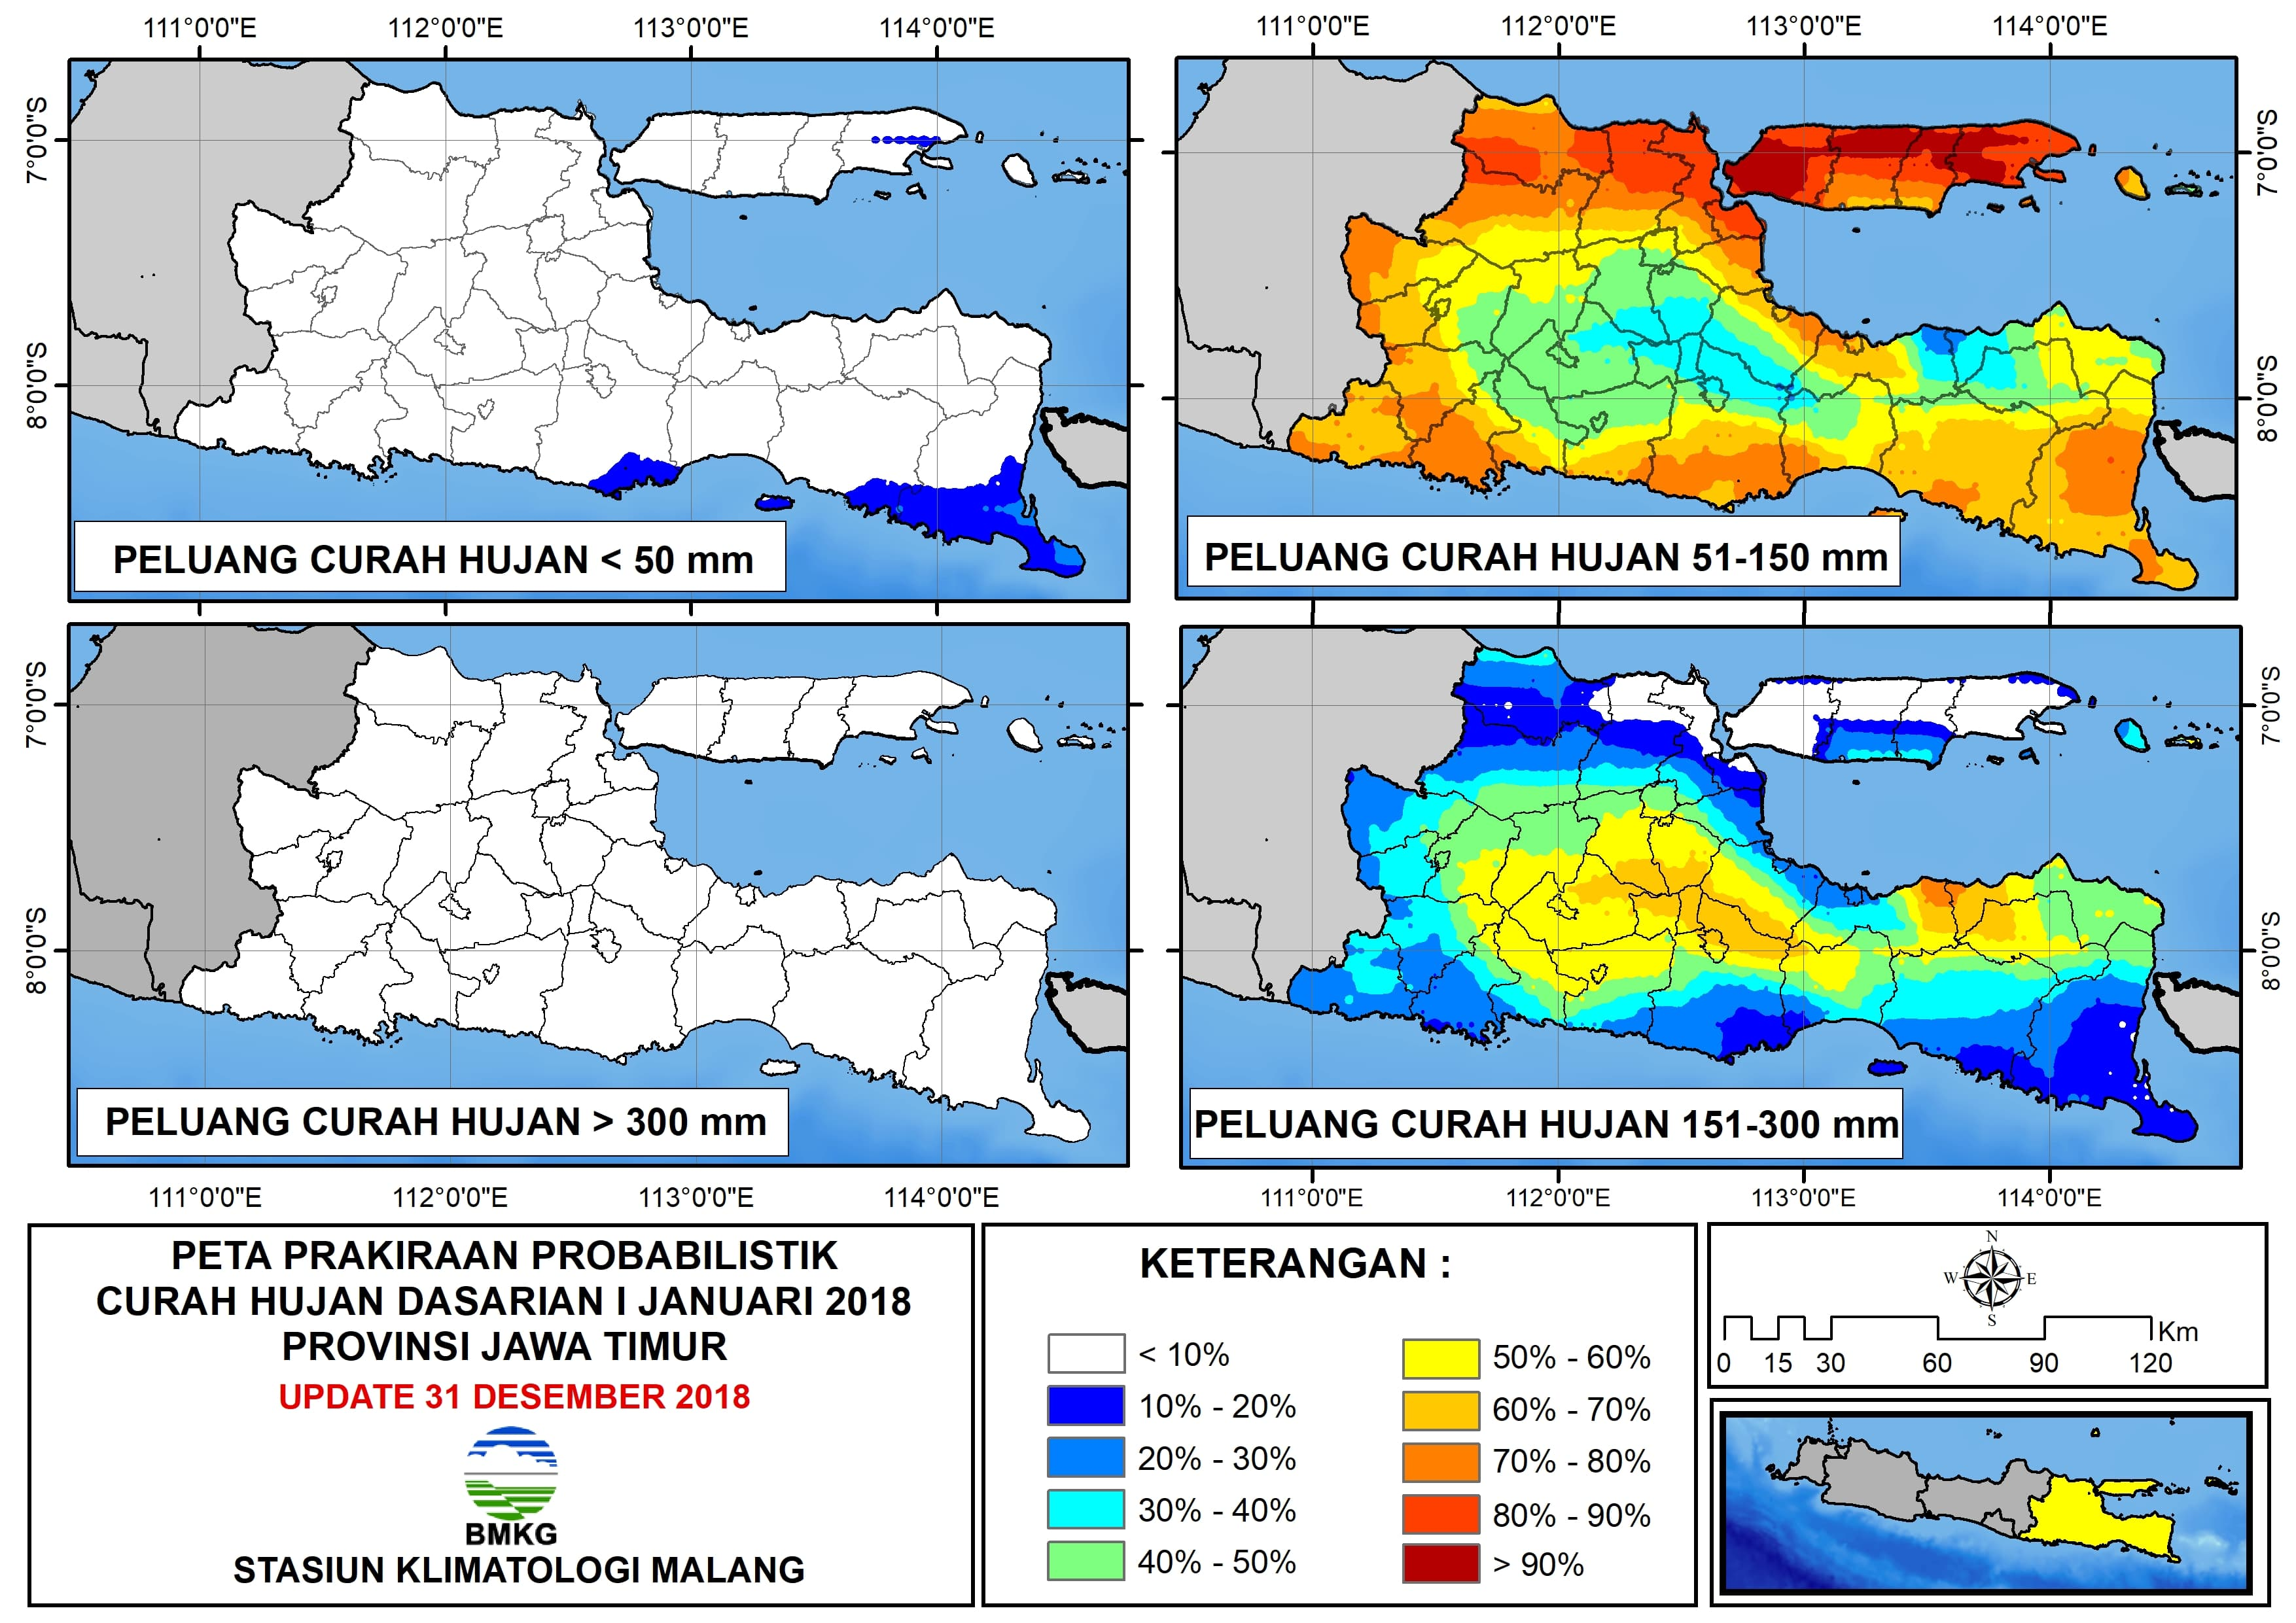 Peta Prakiraan Probabilistik Curah Hujan Dasarian I Januari Provinsi Jawa Timur Update 31 Desember 2018